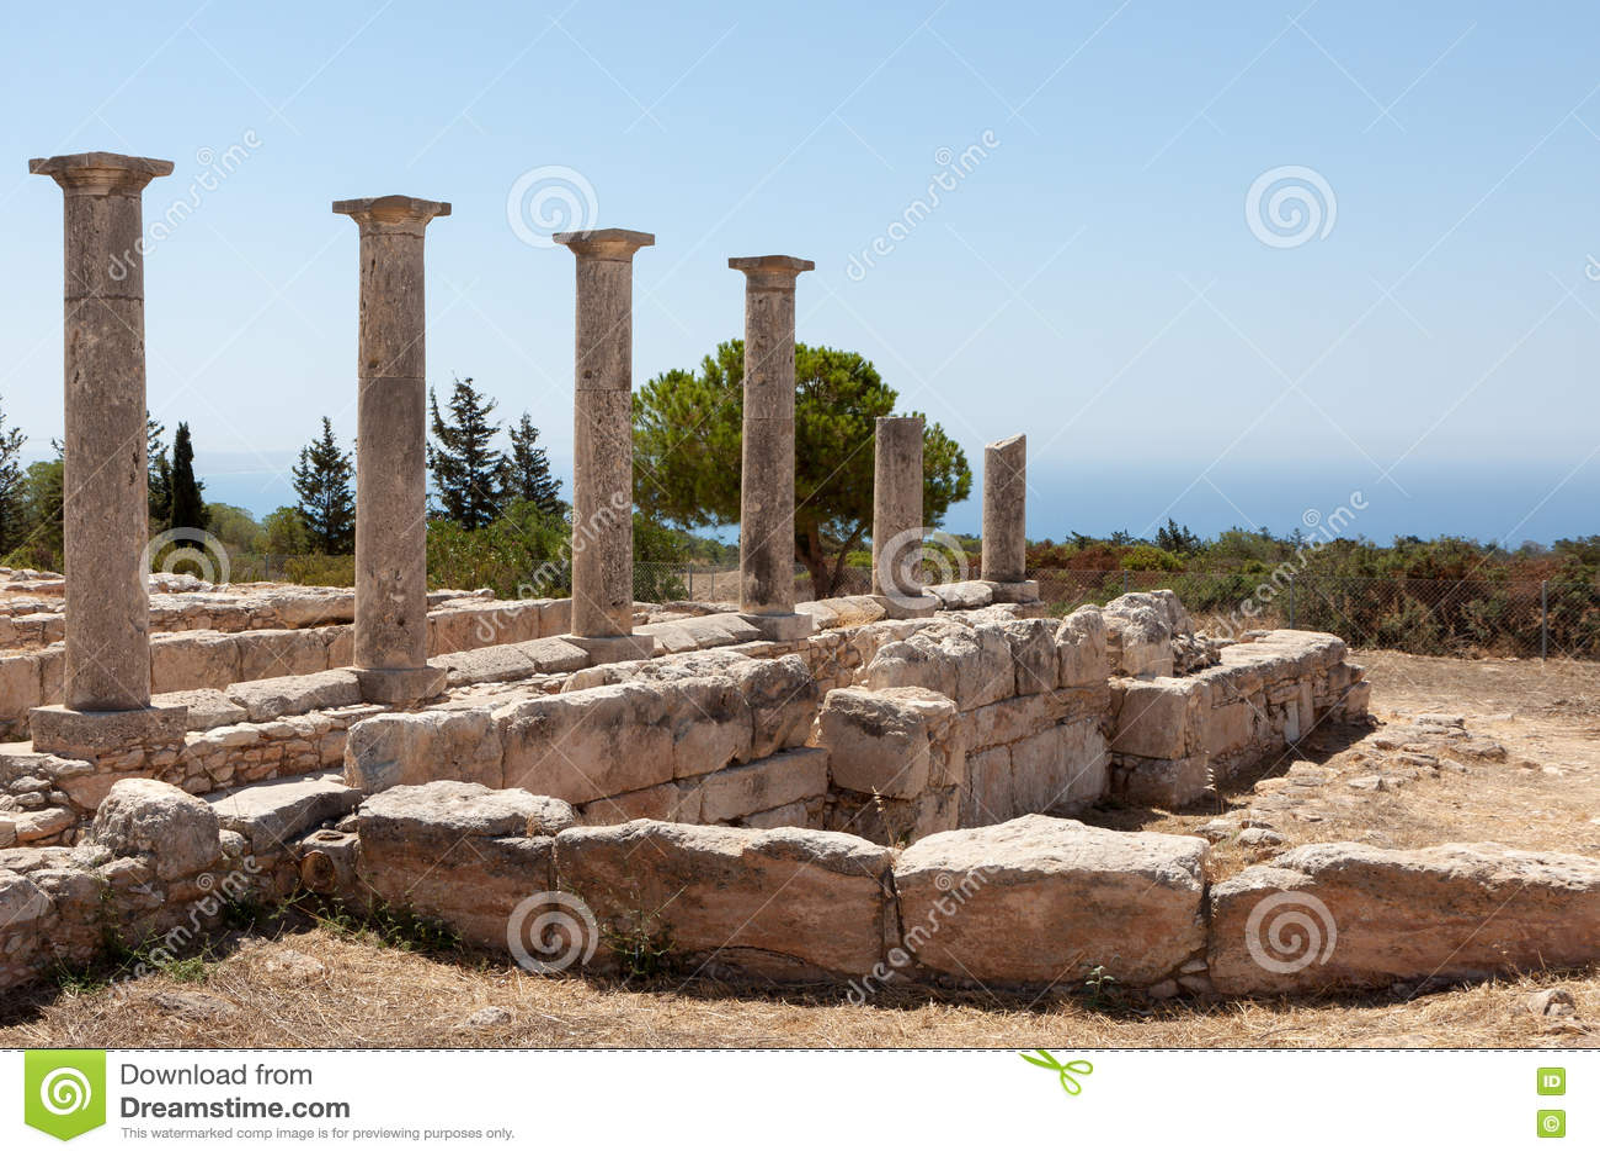 KOURION, CYPRUS/GREECE - LIPIEC 24: Świątynia Apollo blisko Kourion